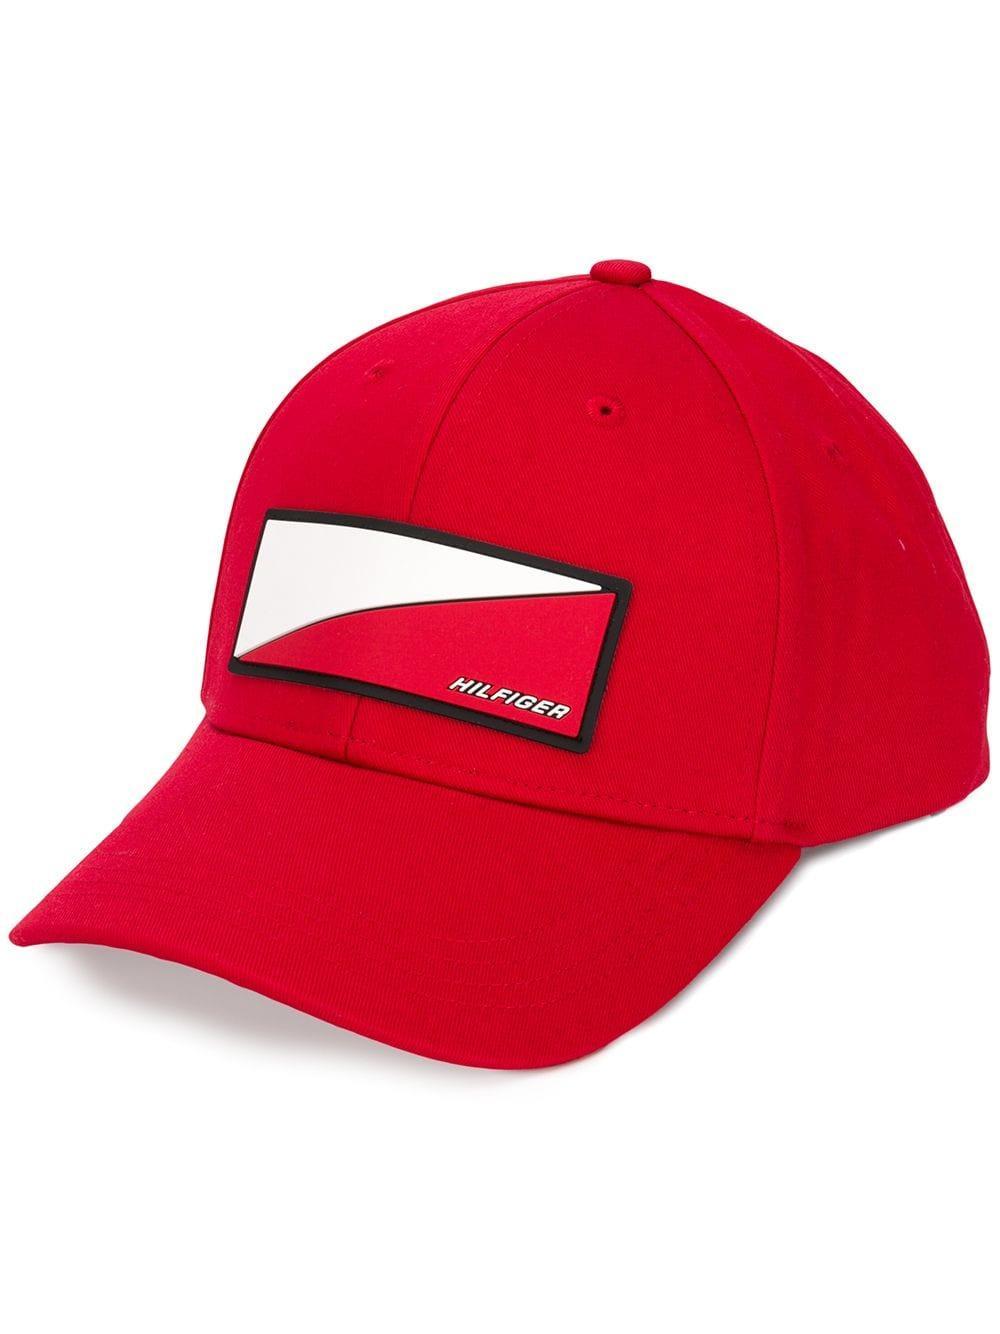 b20d2529bf95 Gorra de béisbol con logo de hombre de color rojo